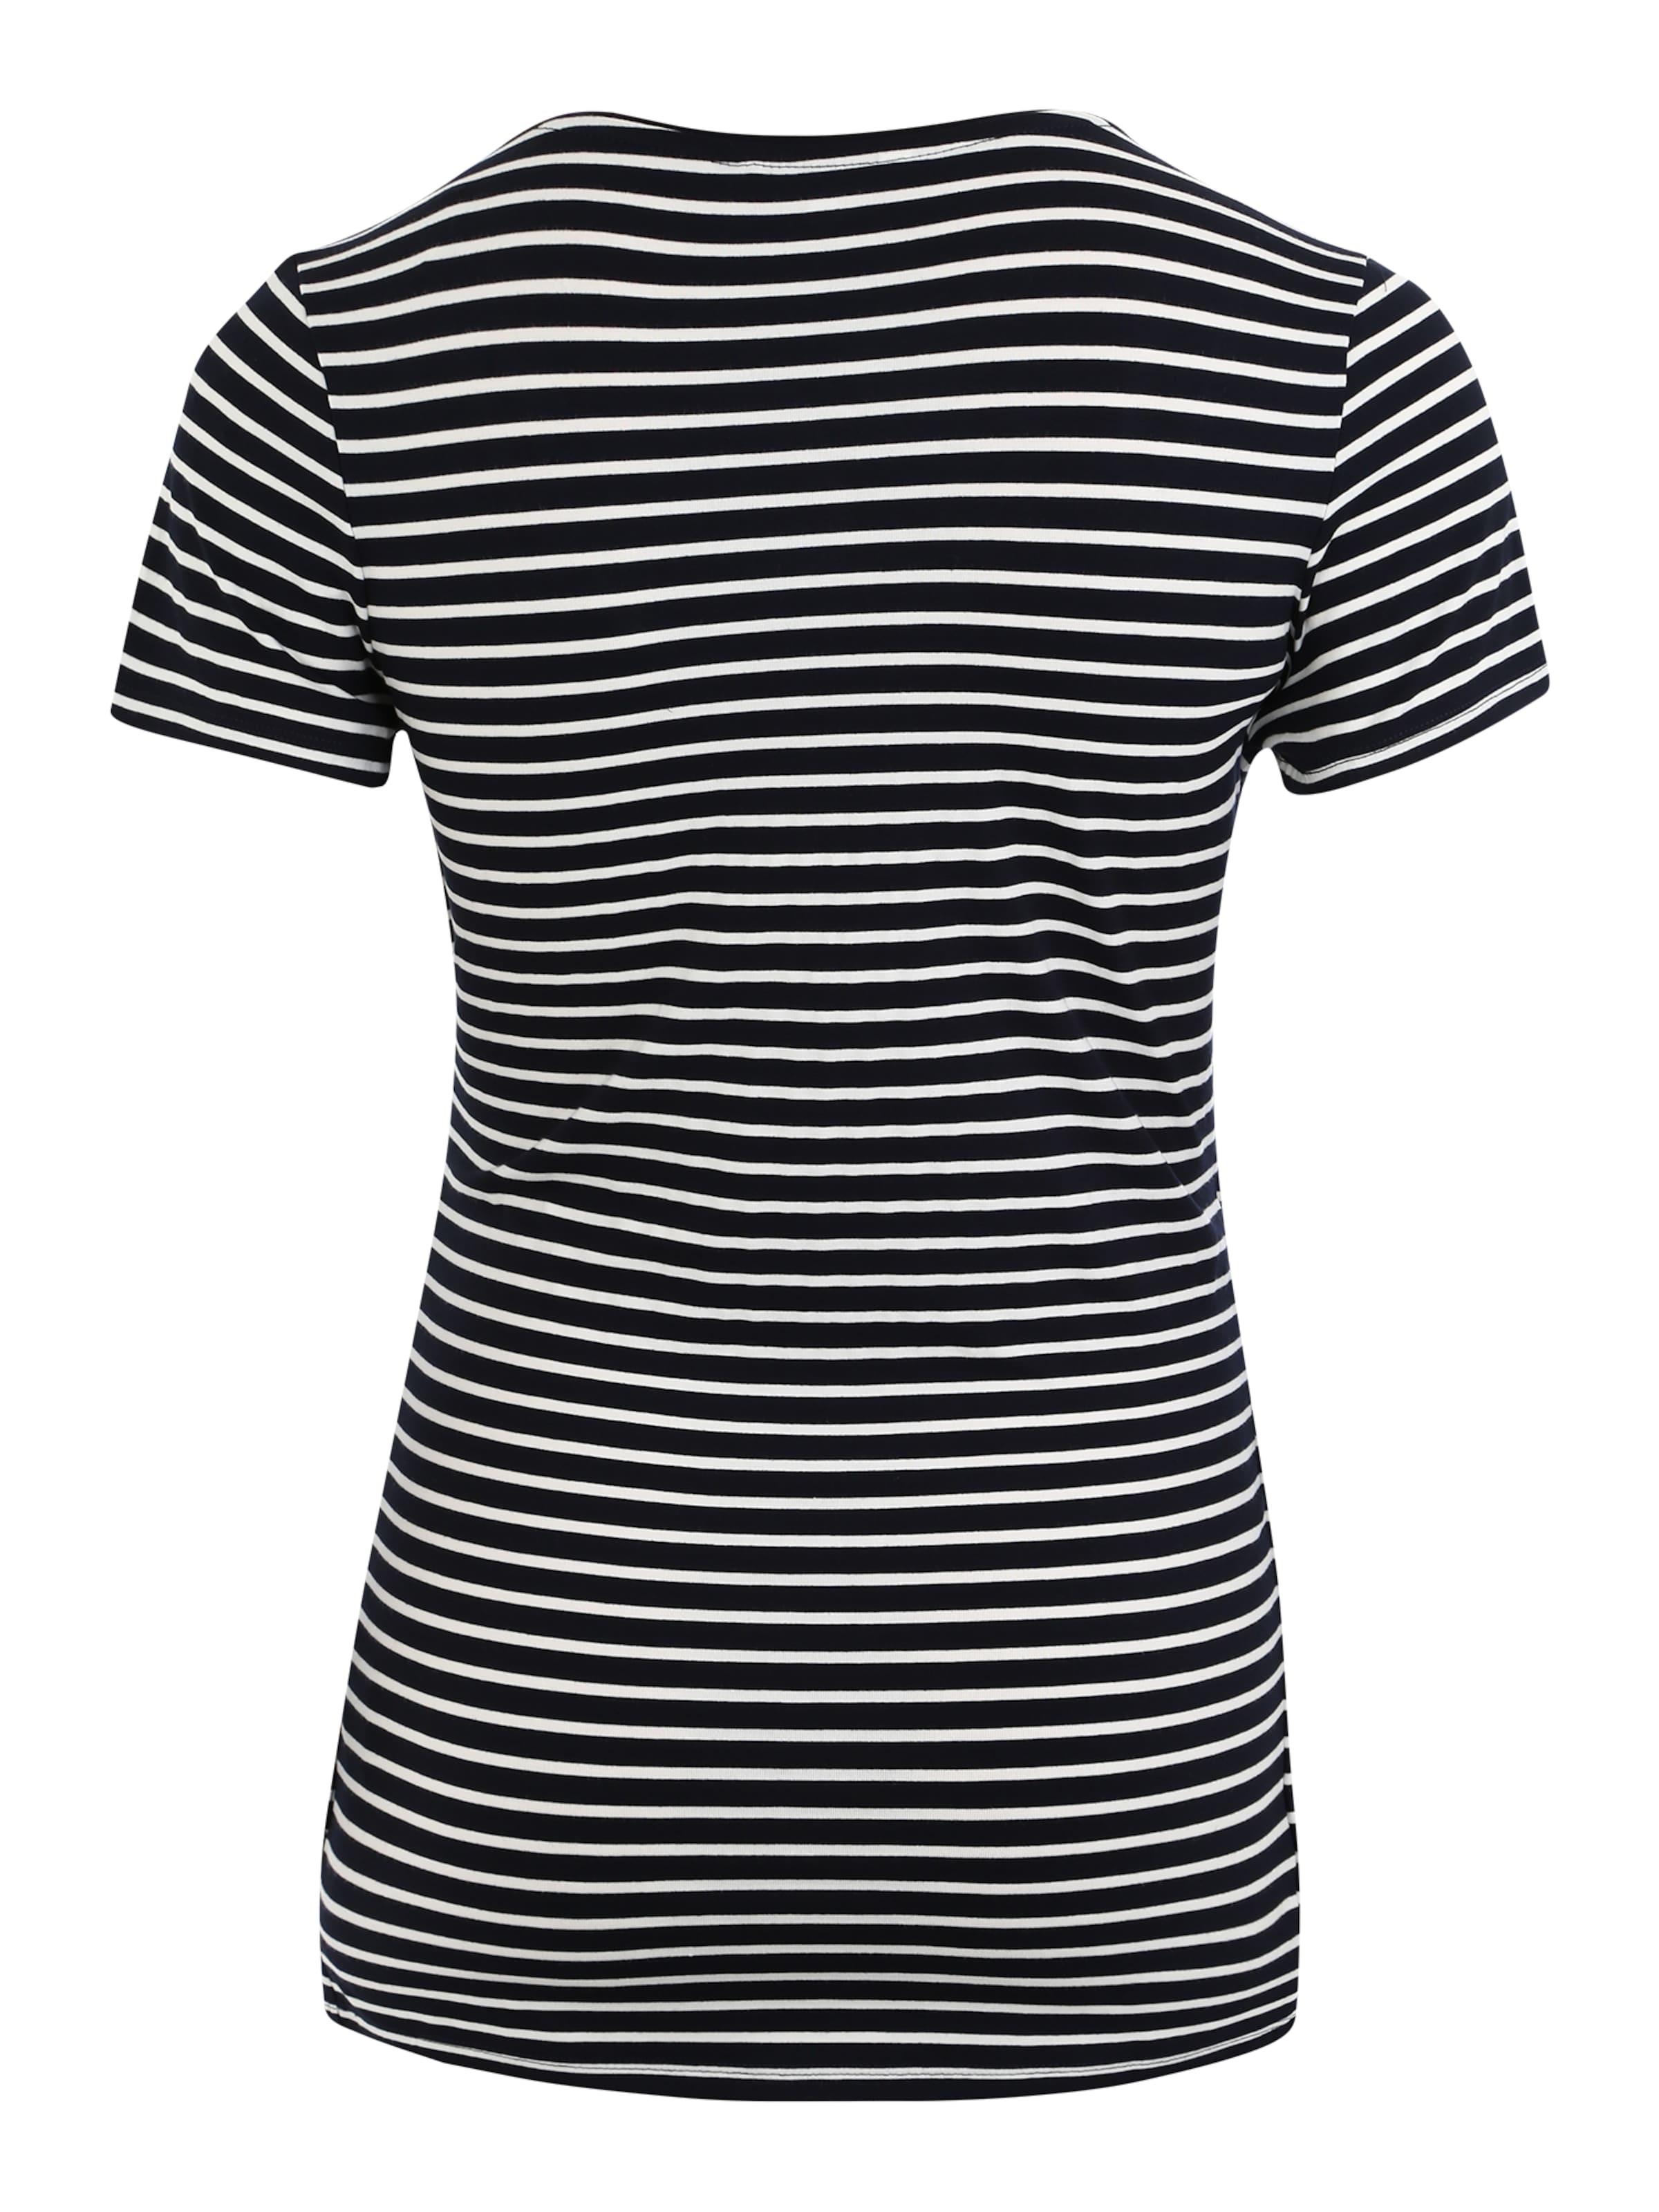 'paris' Nachtblau Noppies Shirt Noppies In SqzpUMVG